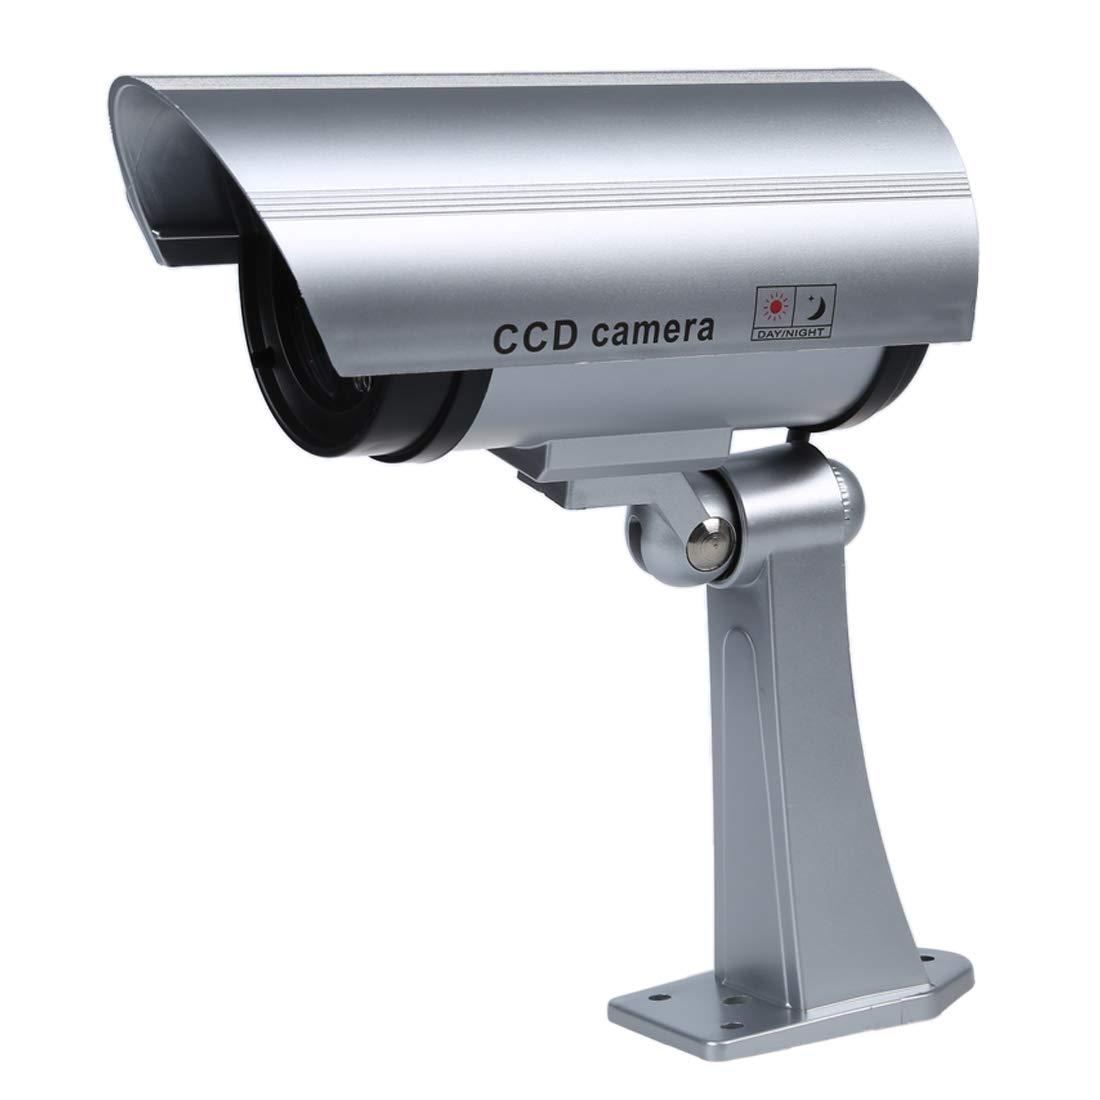 SODIAL(R) Camaras de Vigilancia Seguridad IR Simulado / Falso Inalambrico Impermeable. Con Luz Intermitente LED Rojo, LED IR Falso. Soporte de Montaje Incluido product image